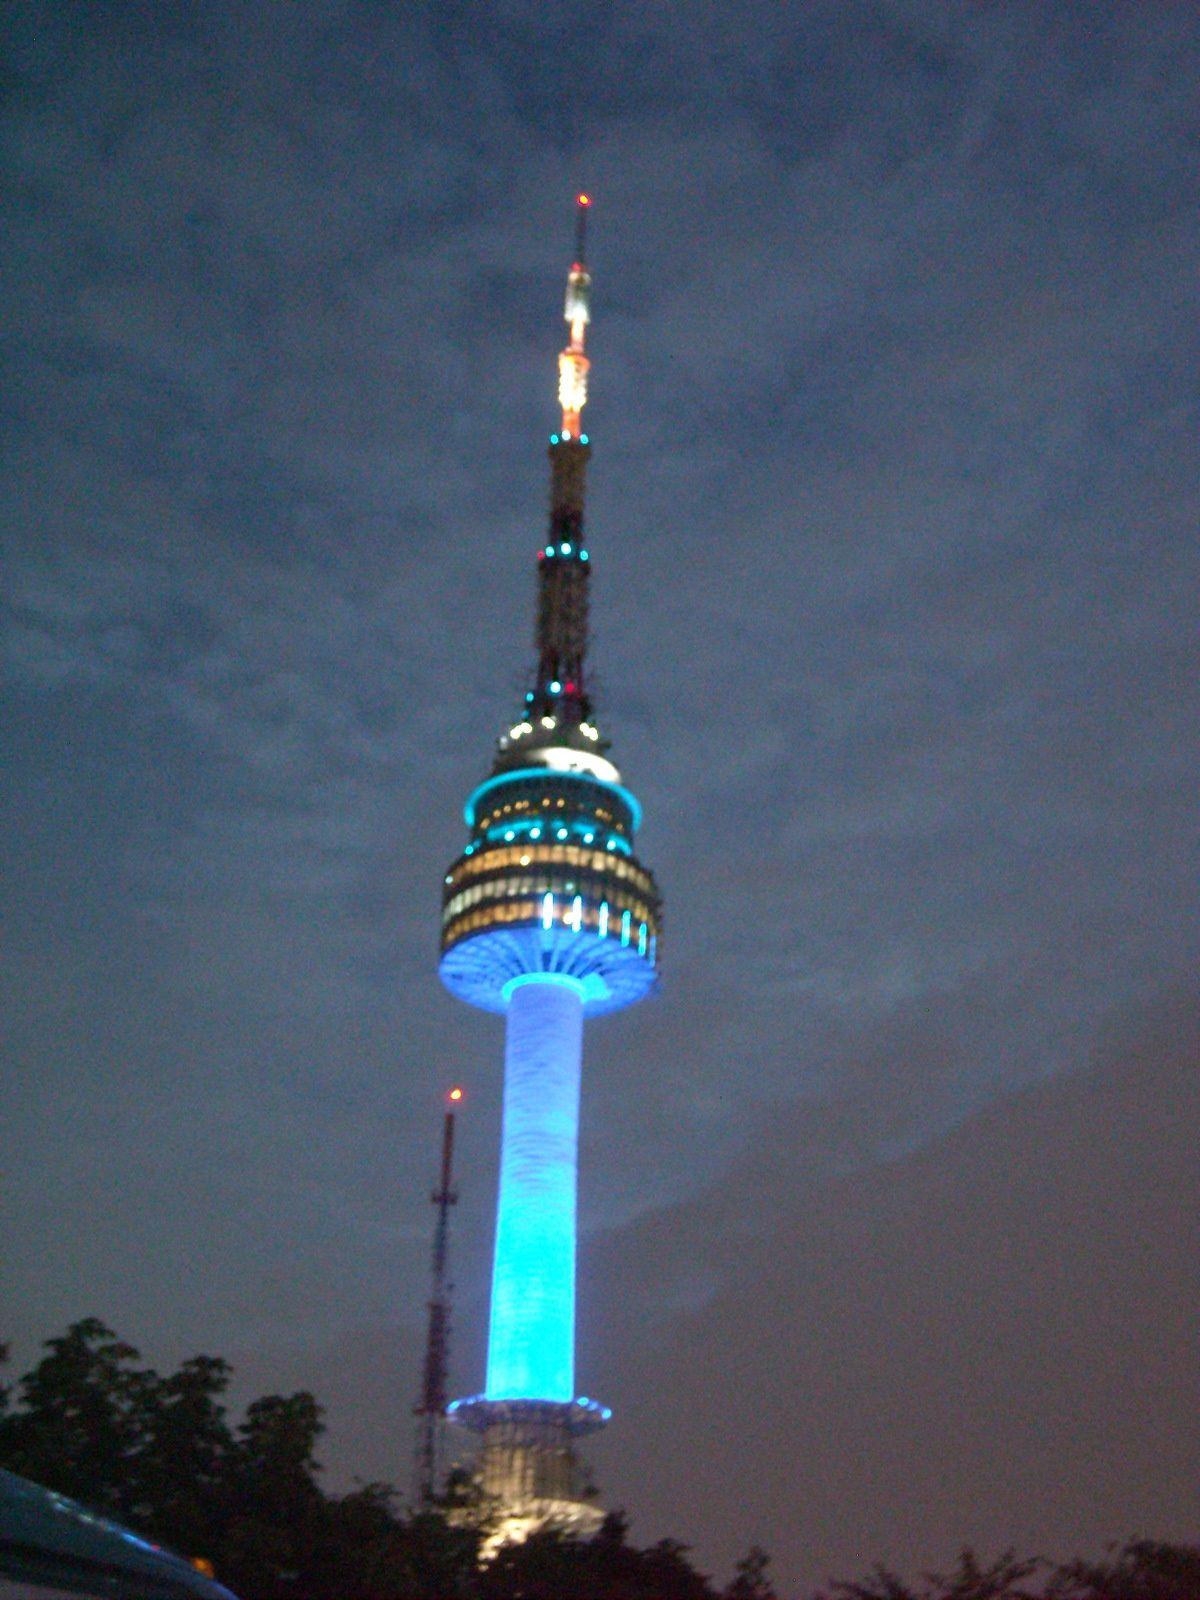 1 a 12. Gyeongbokgung   13 a 23. Changdokgung et Biwon   24 a 27. Namsan Tower